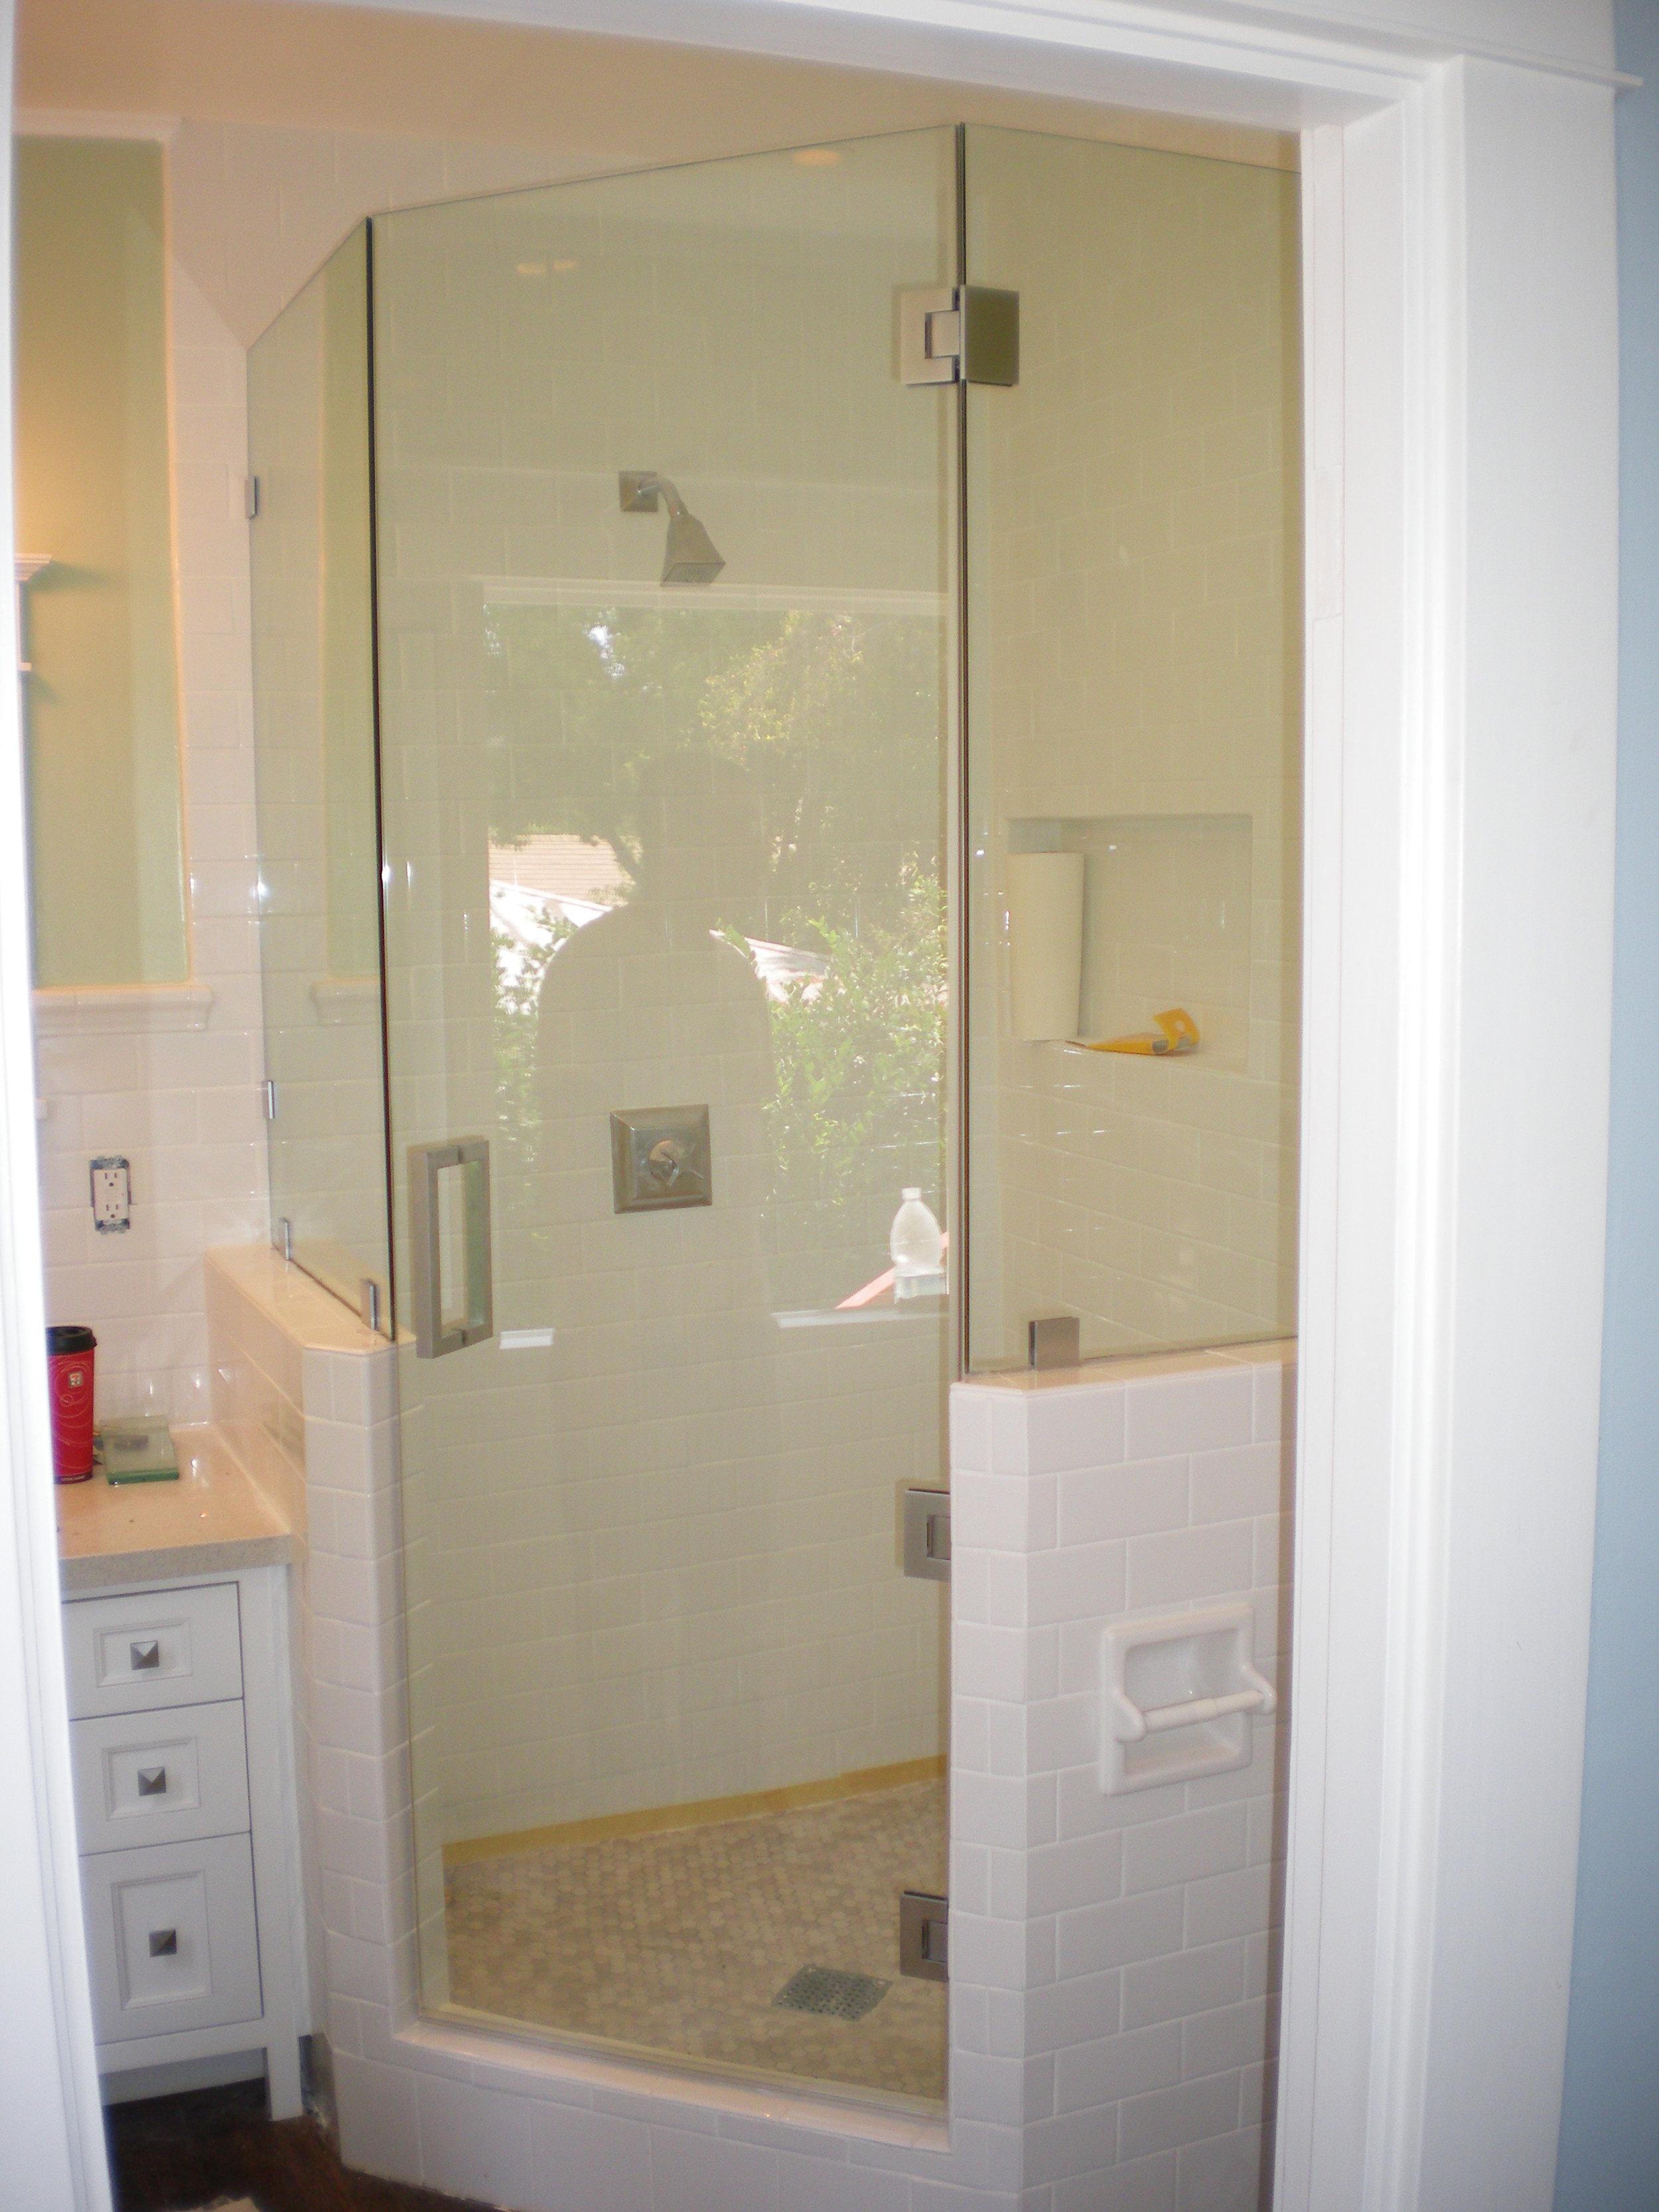 Shower-Doors-Residential-Photos-32.jpg